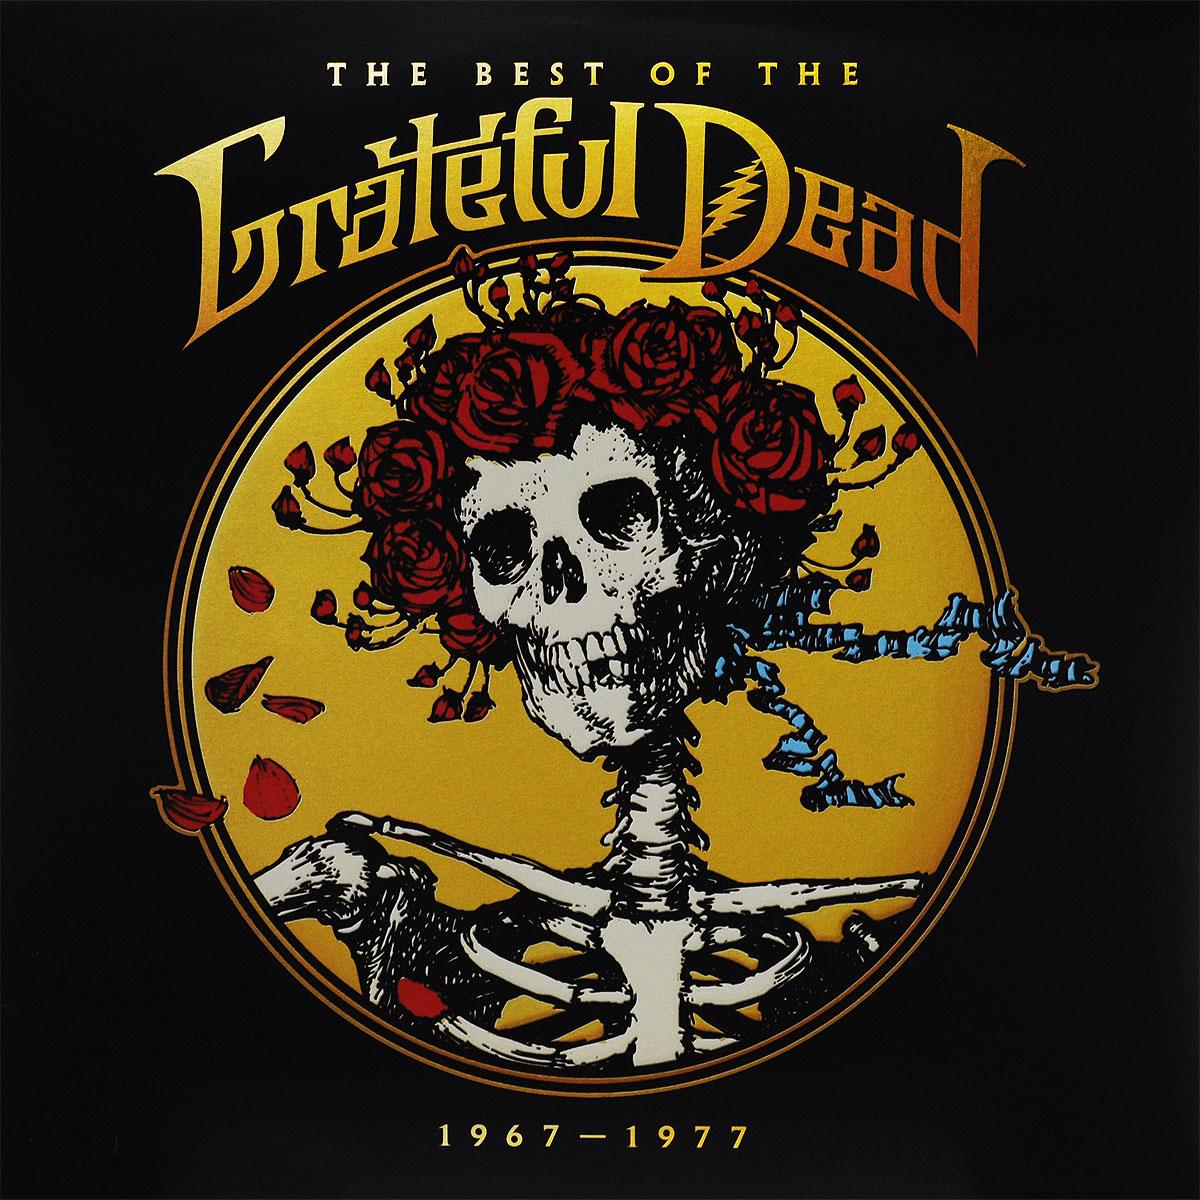 The Grateful Dead Grateful Dead. The Best Of The Grateful Dead (2 LP) grateful dead grateful dead the best of the grateful dead 1967 1977 2 lp